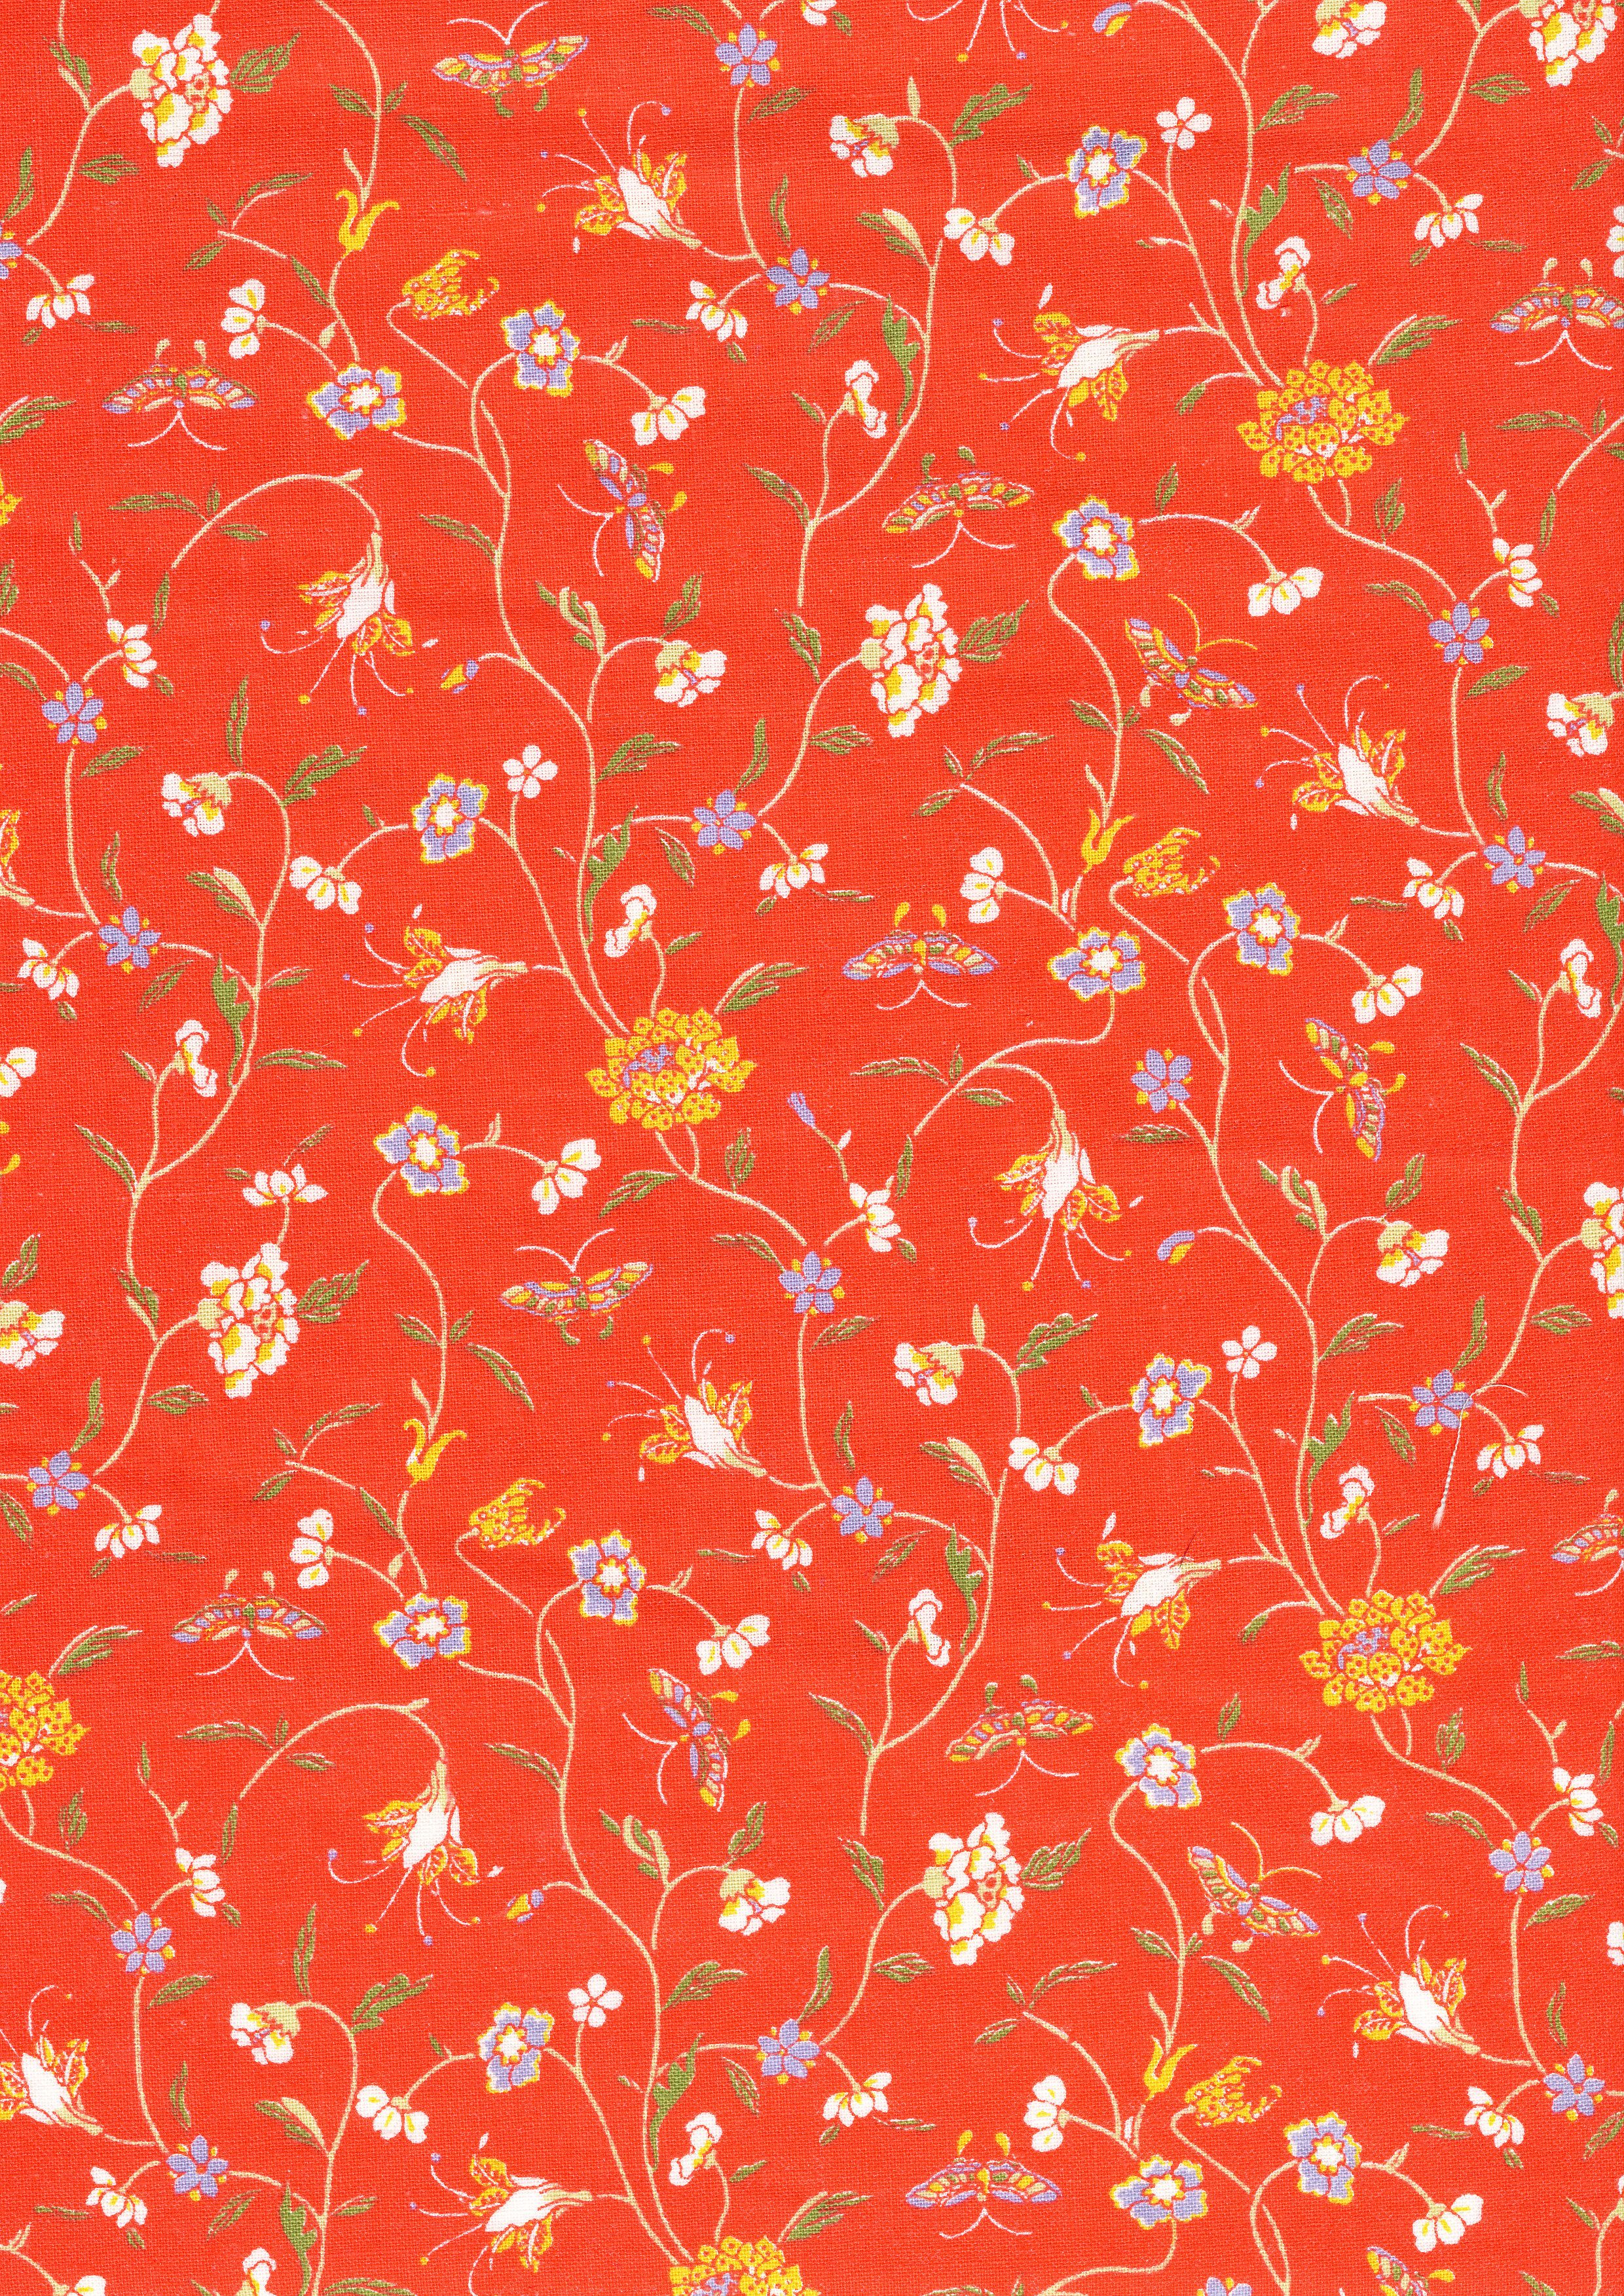 Laura ashley vintage nursery wallpaper border-mary mary